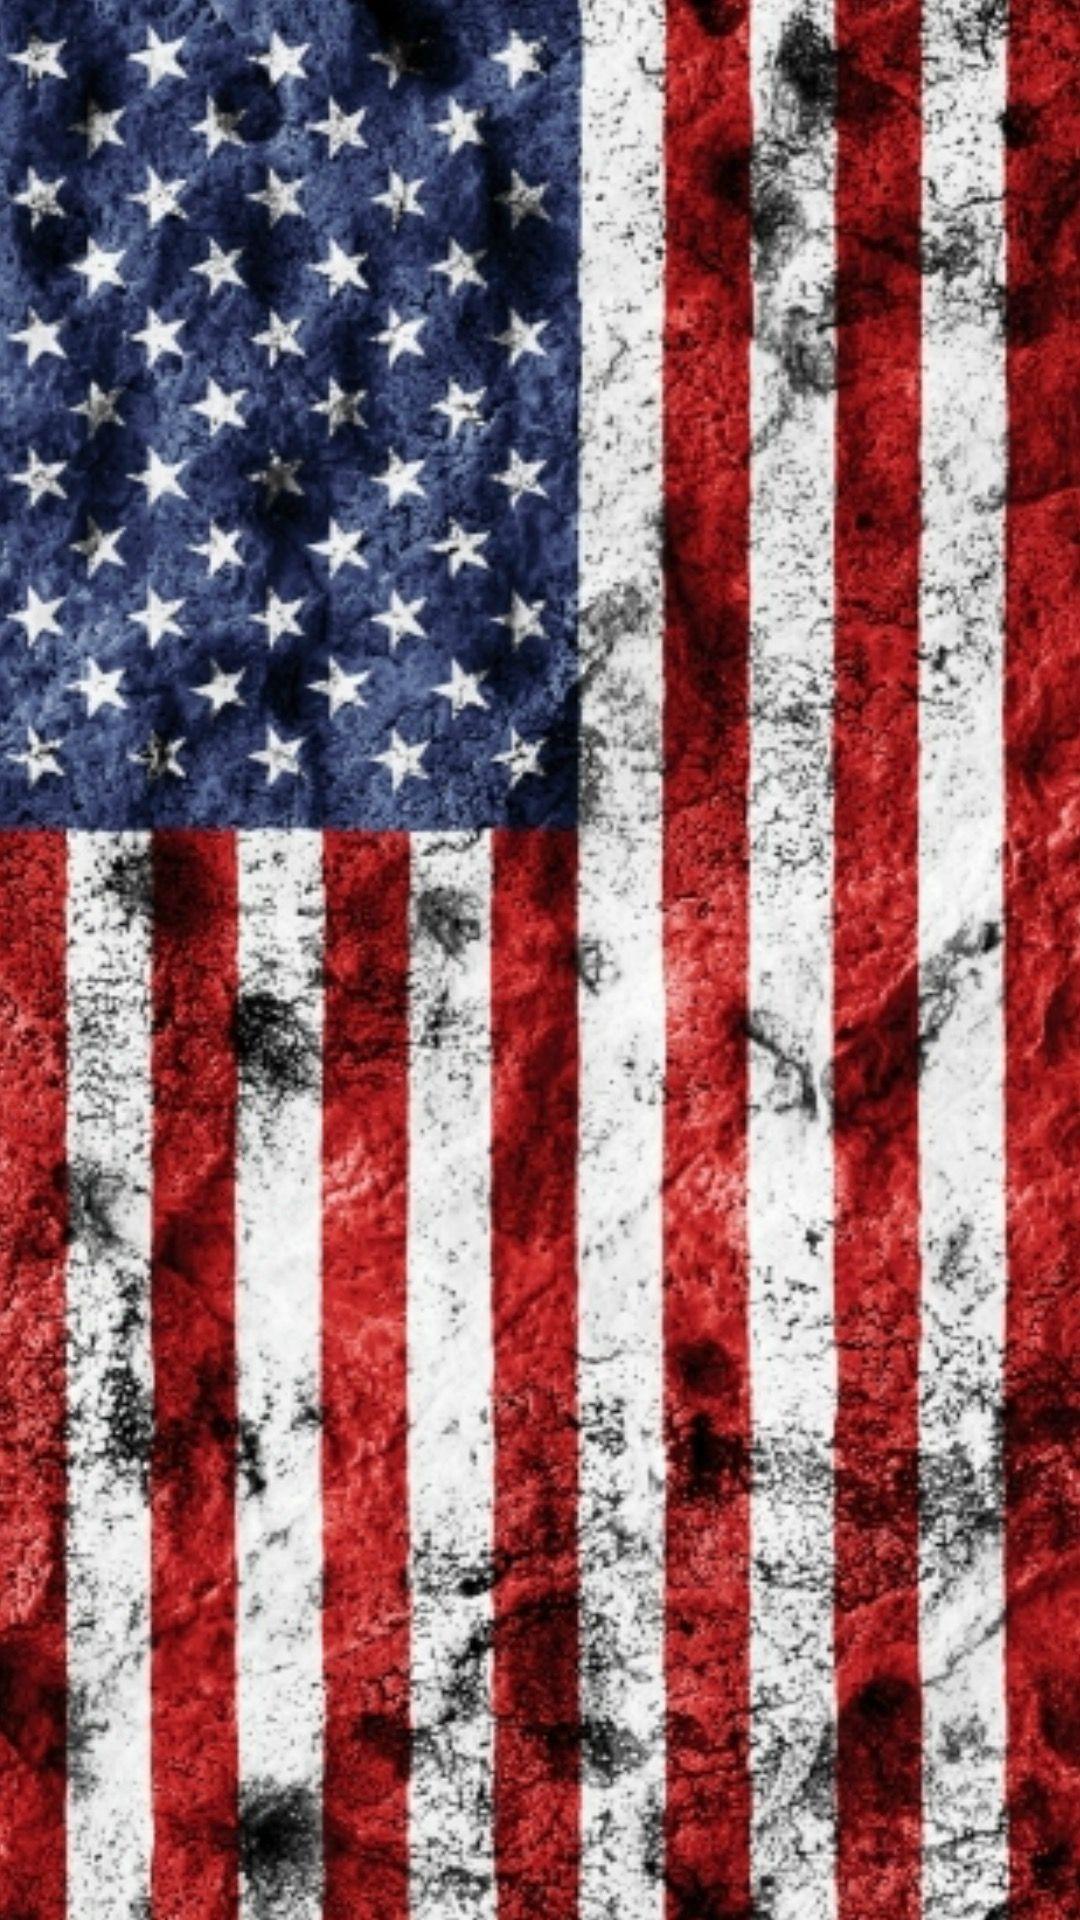 Camo Flag Wallpaper : wallpaper, Freitas, ¶l€¥BO¥, American, Wallpaper,, England, Background